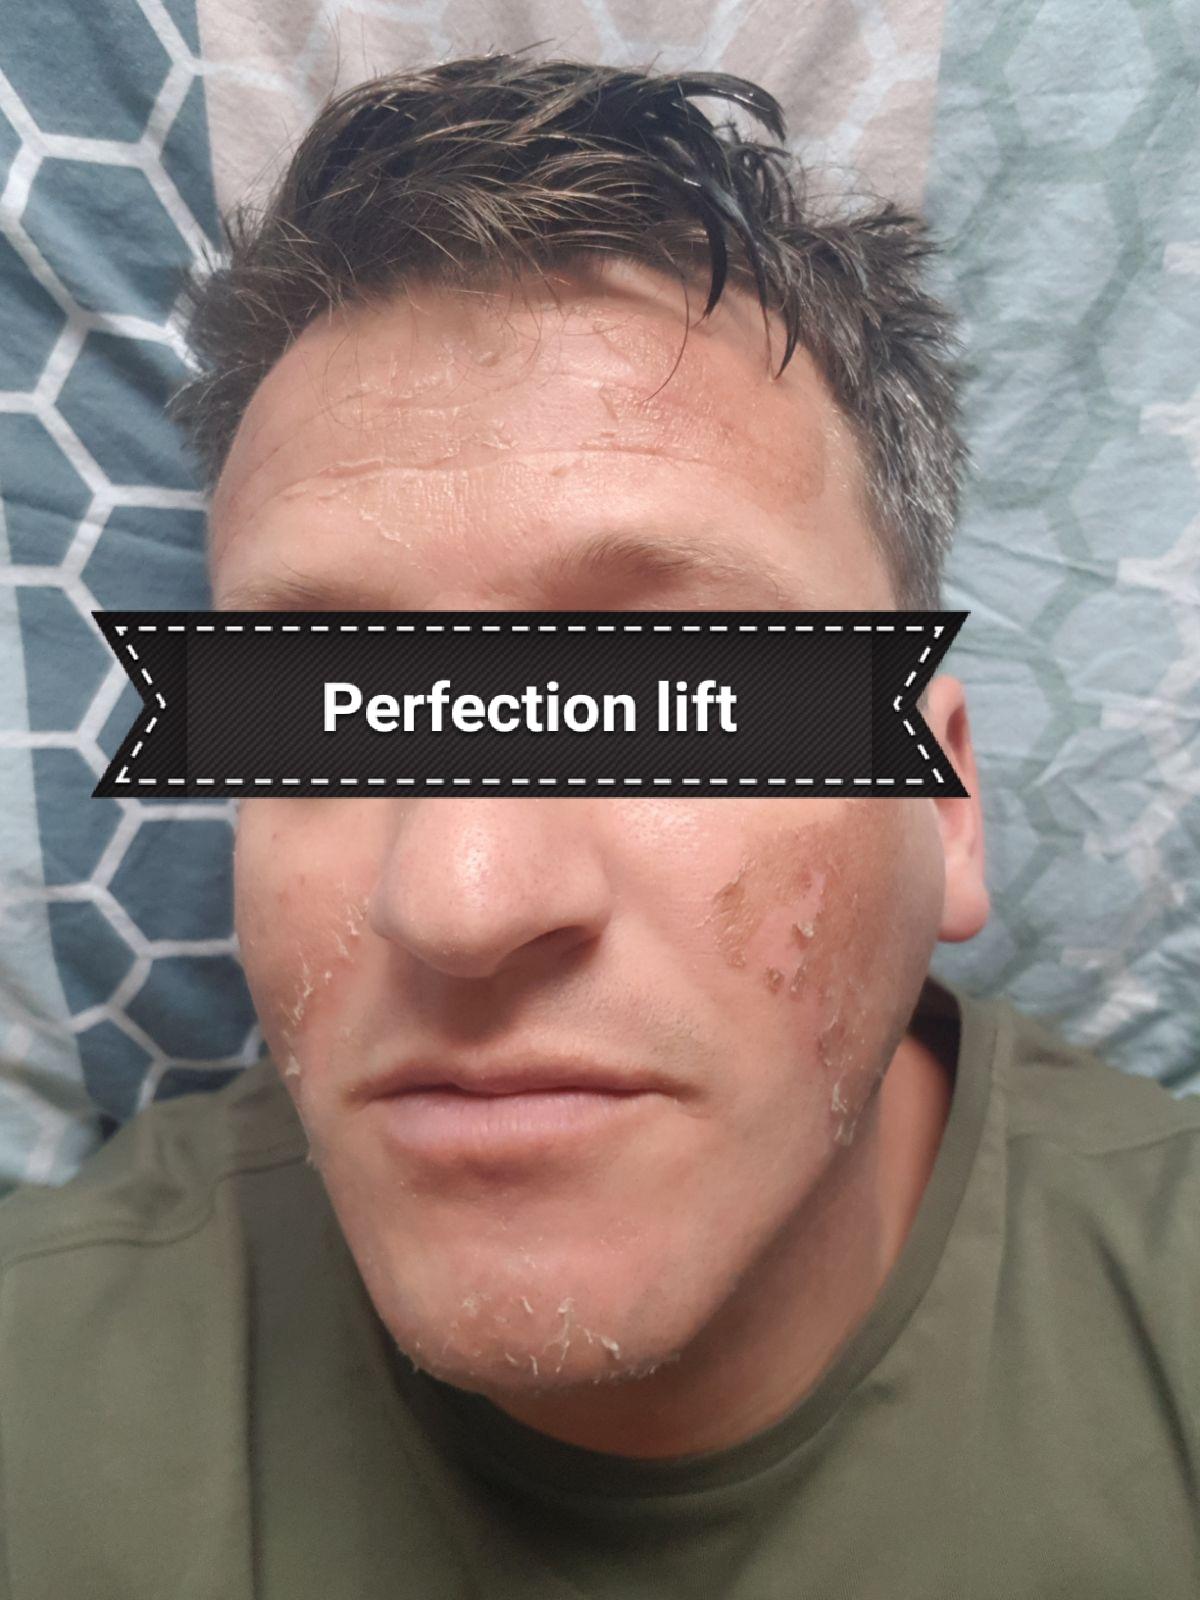 Perfection lift peeling